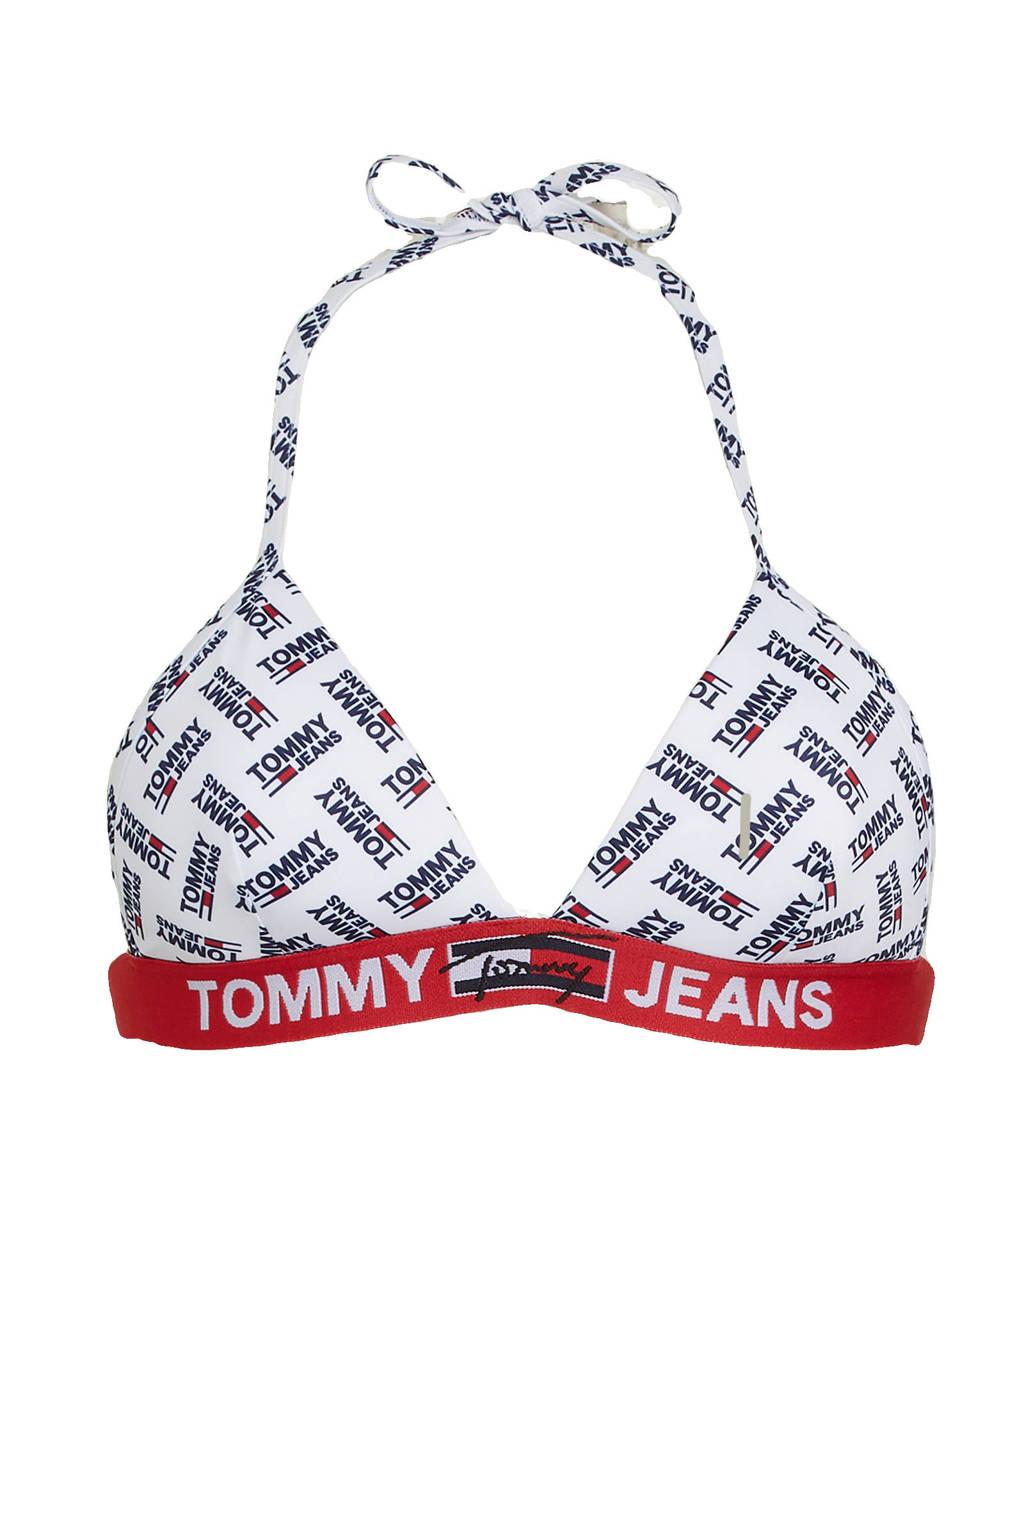 Tommy Hilfiger triangel bikinitop met all over print wit/zwart/rood, Wit/zwart/rood